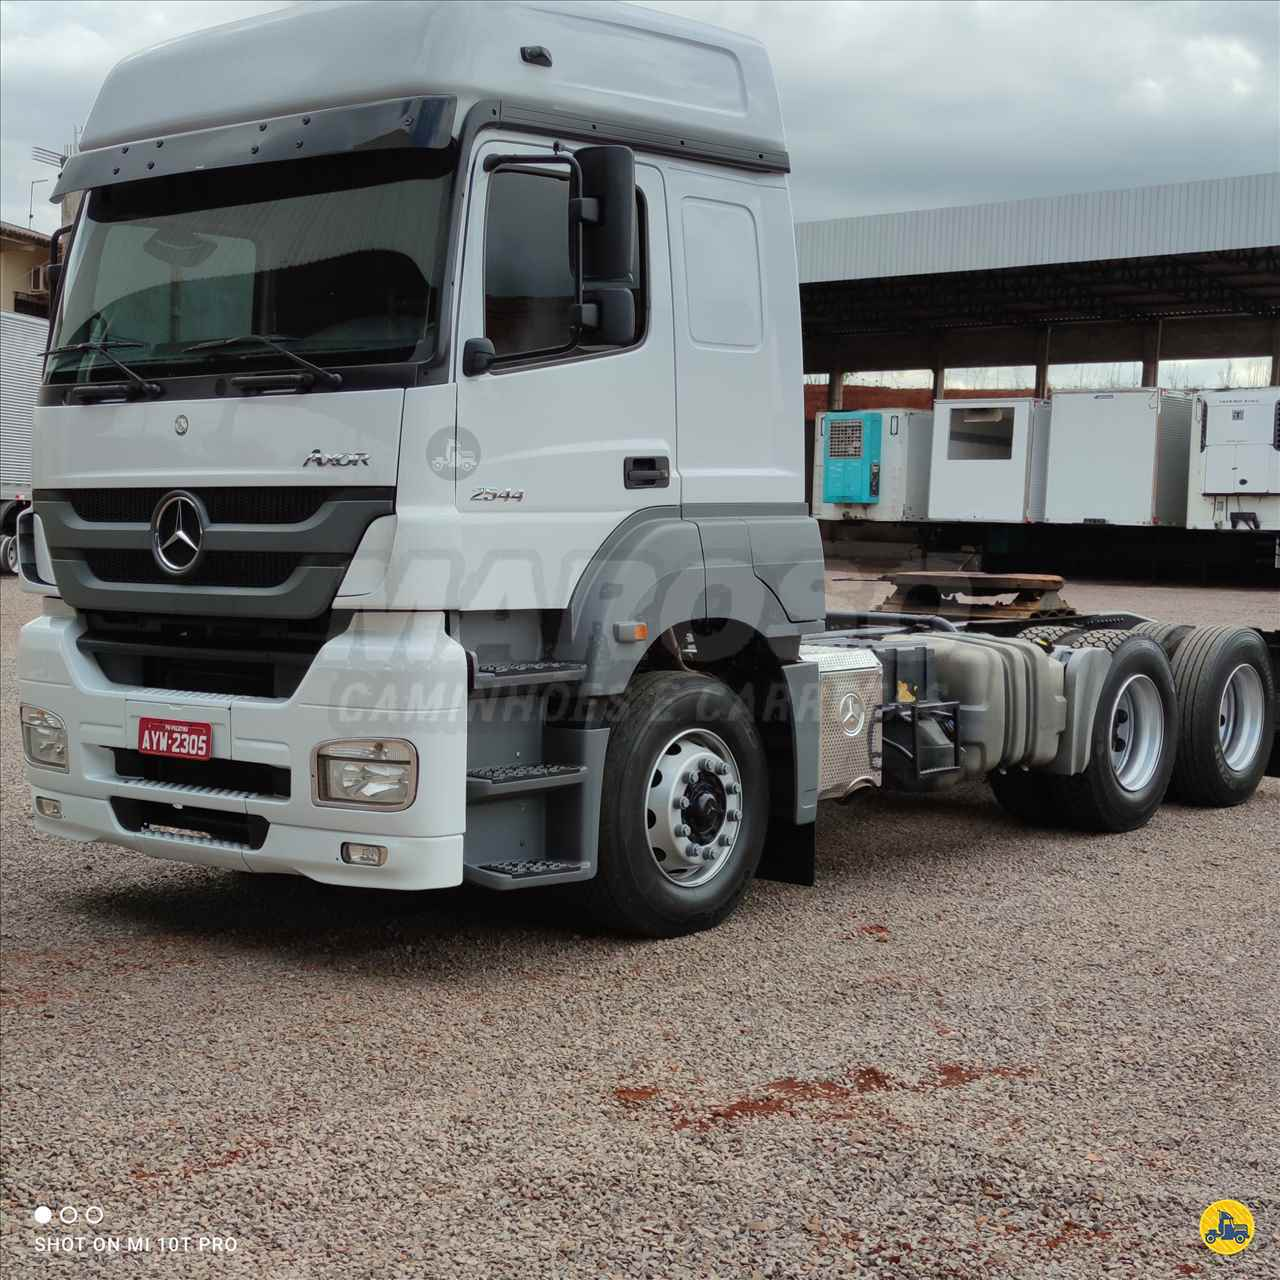 MB 2544 de Maroso Caminhões - PALOTINA/PR